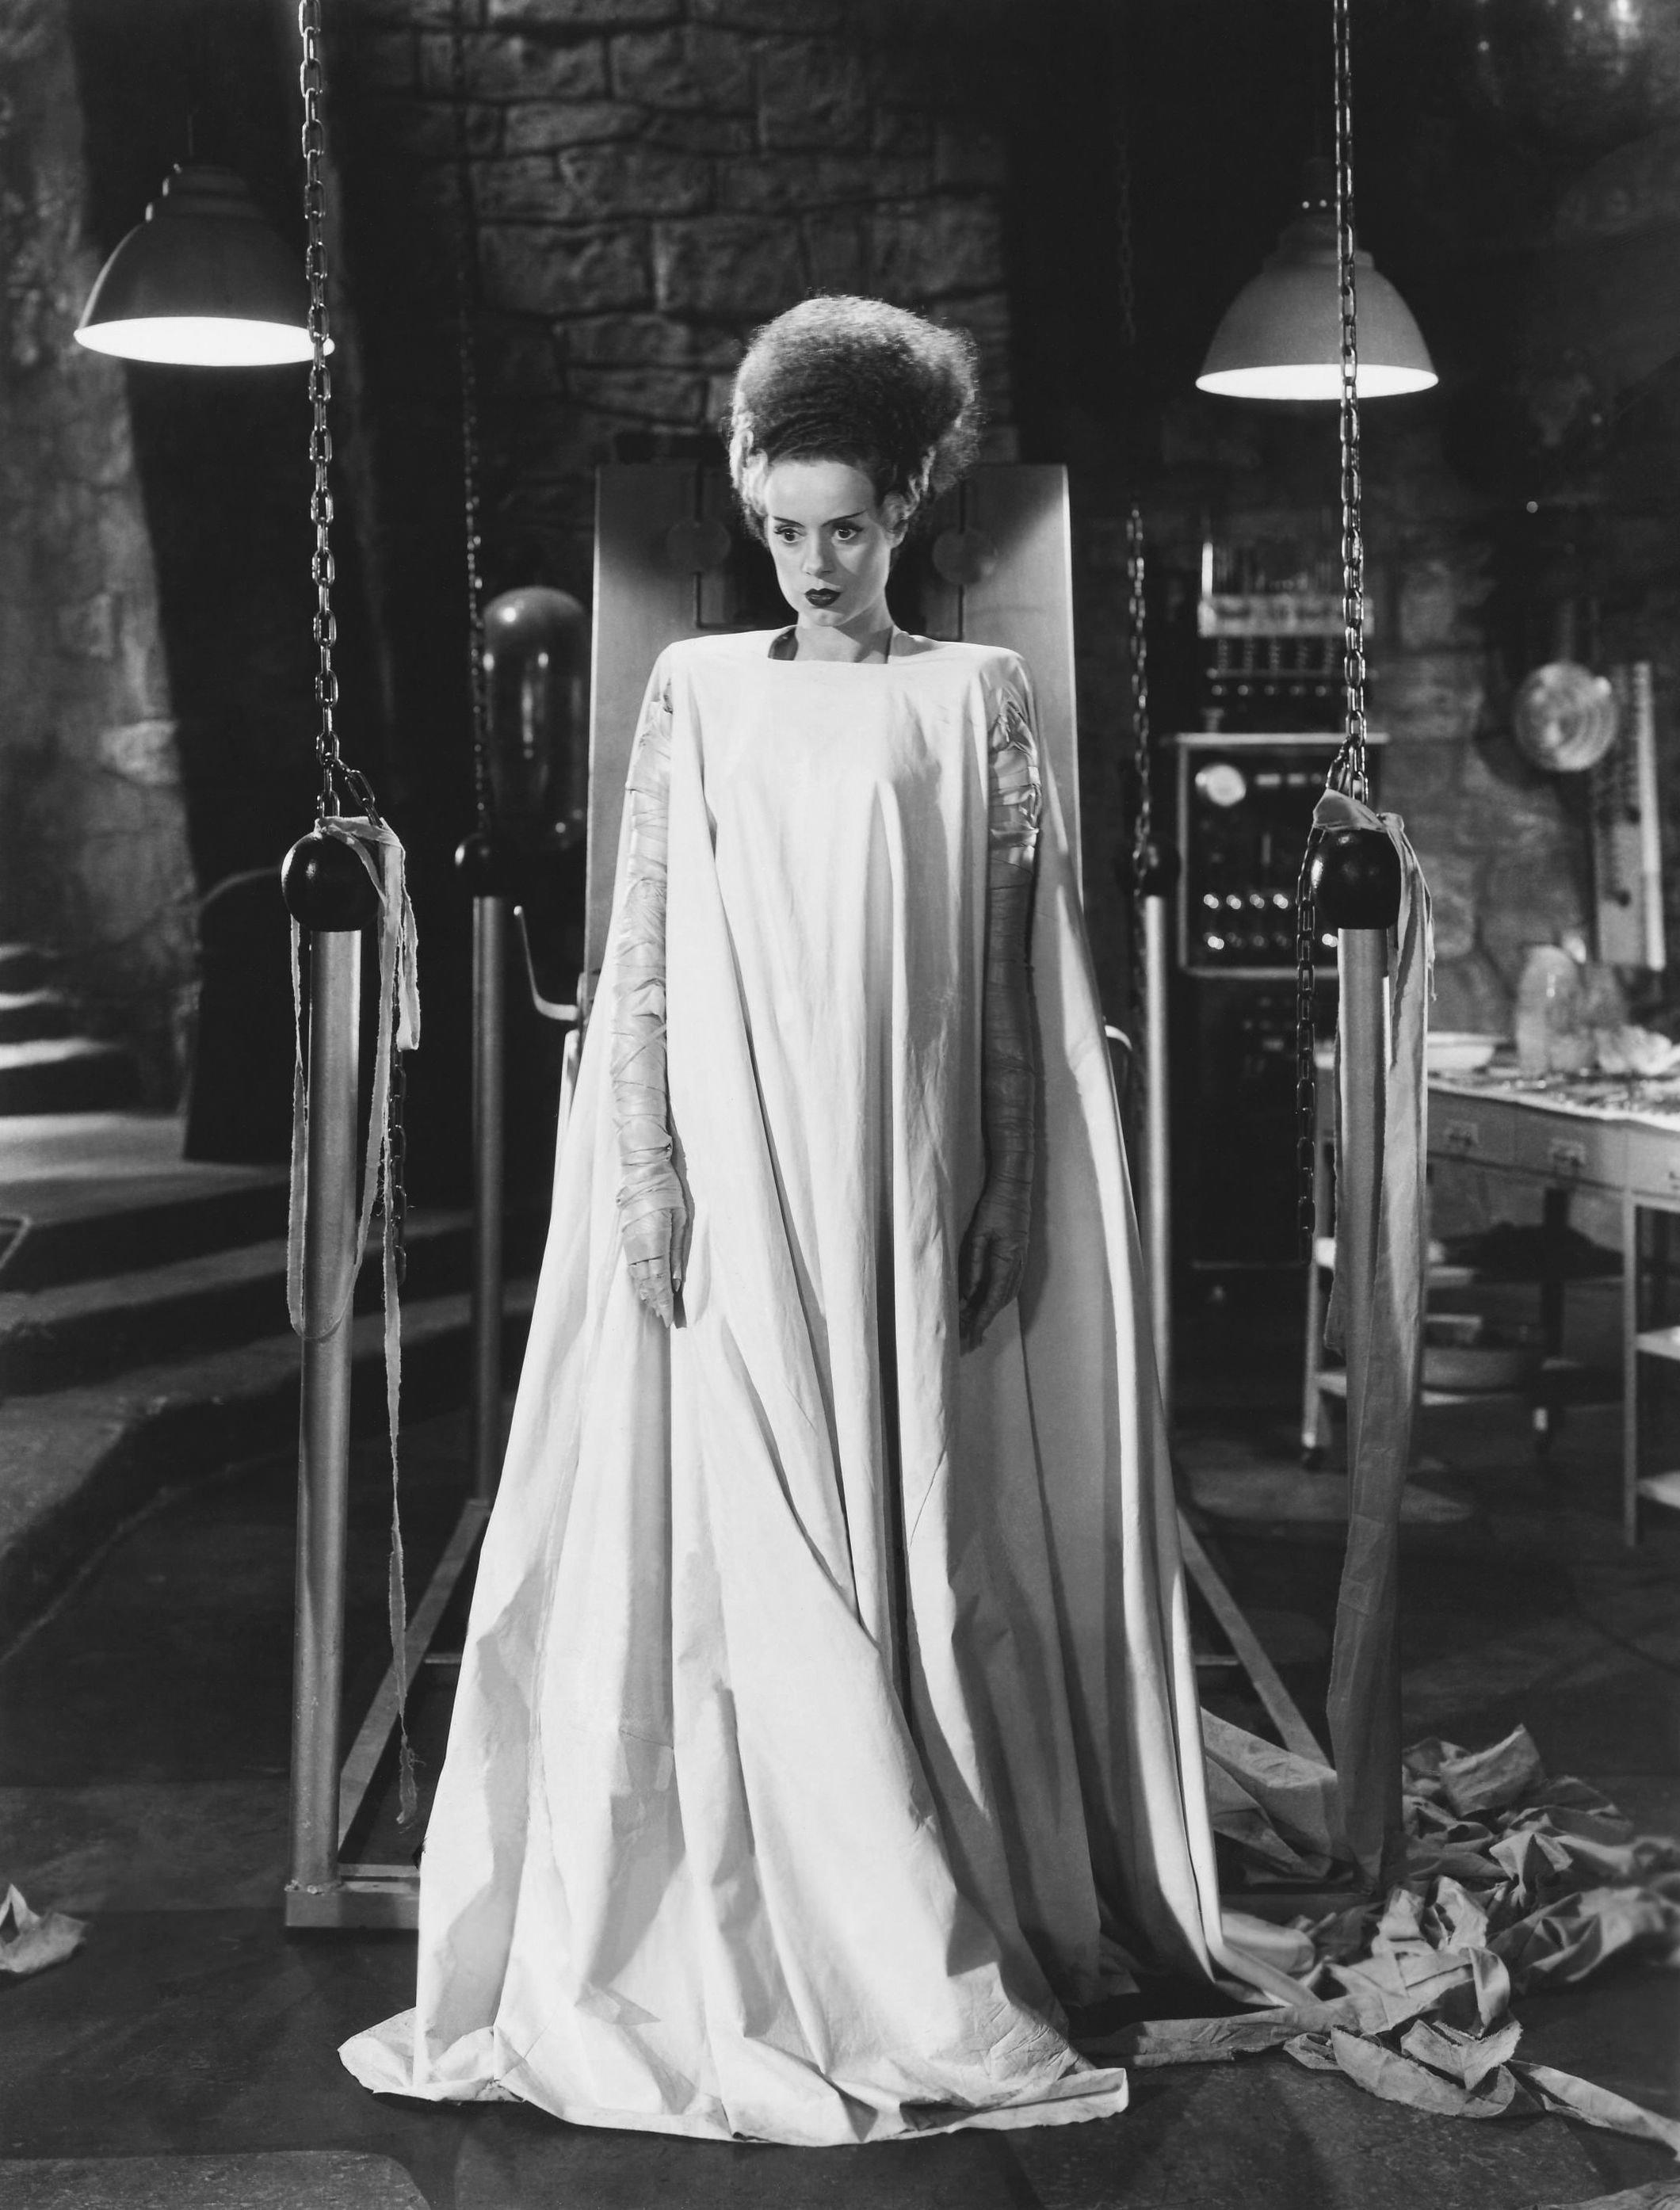 10 Perfect Bride Of Frankenstein Costume Ideas the bride of frankenstein 1935 halloween pinterest 2021